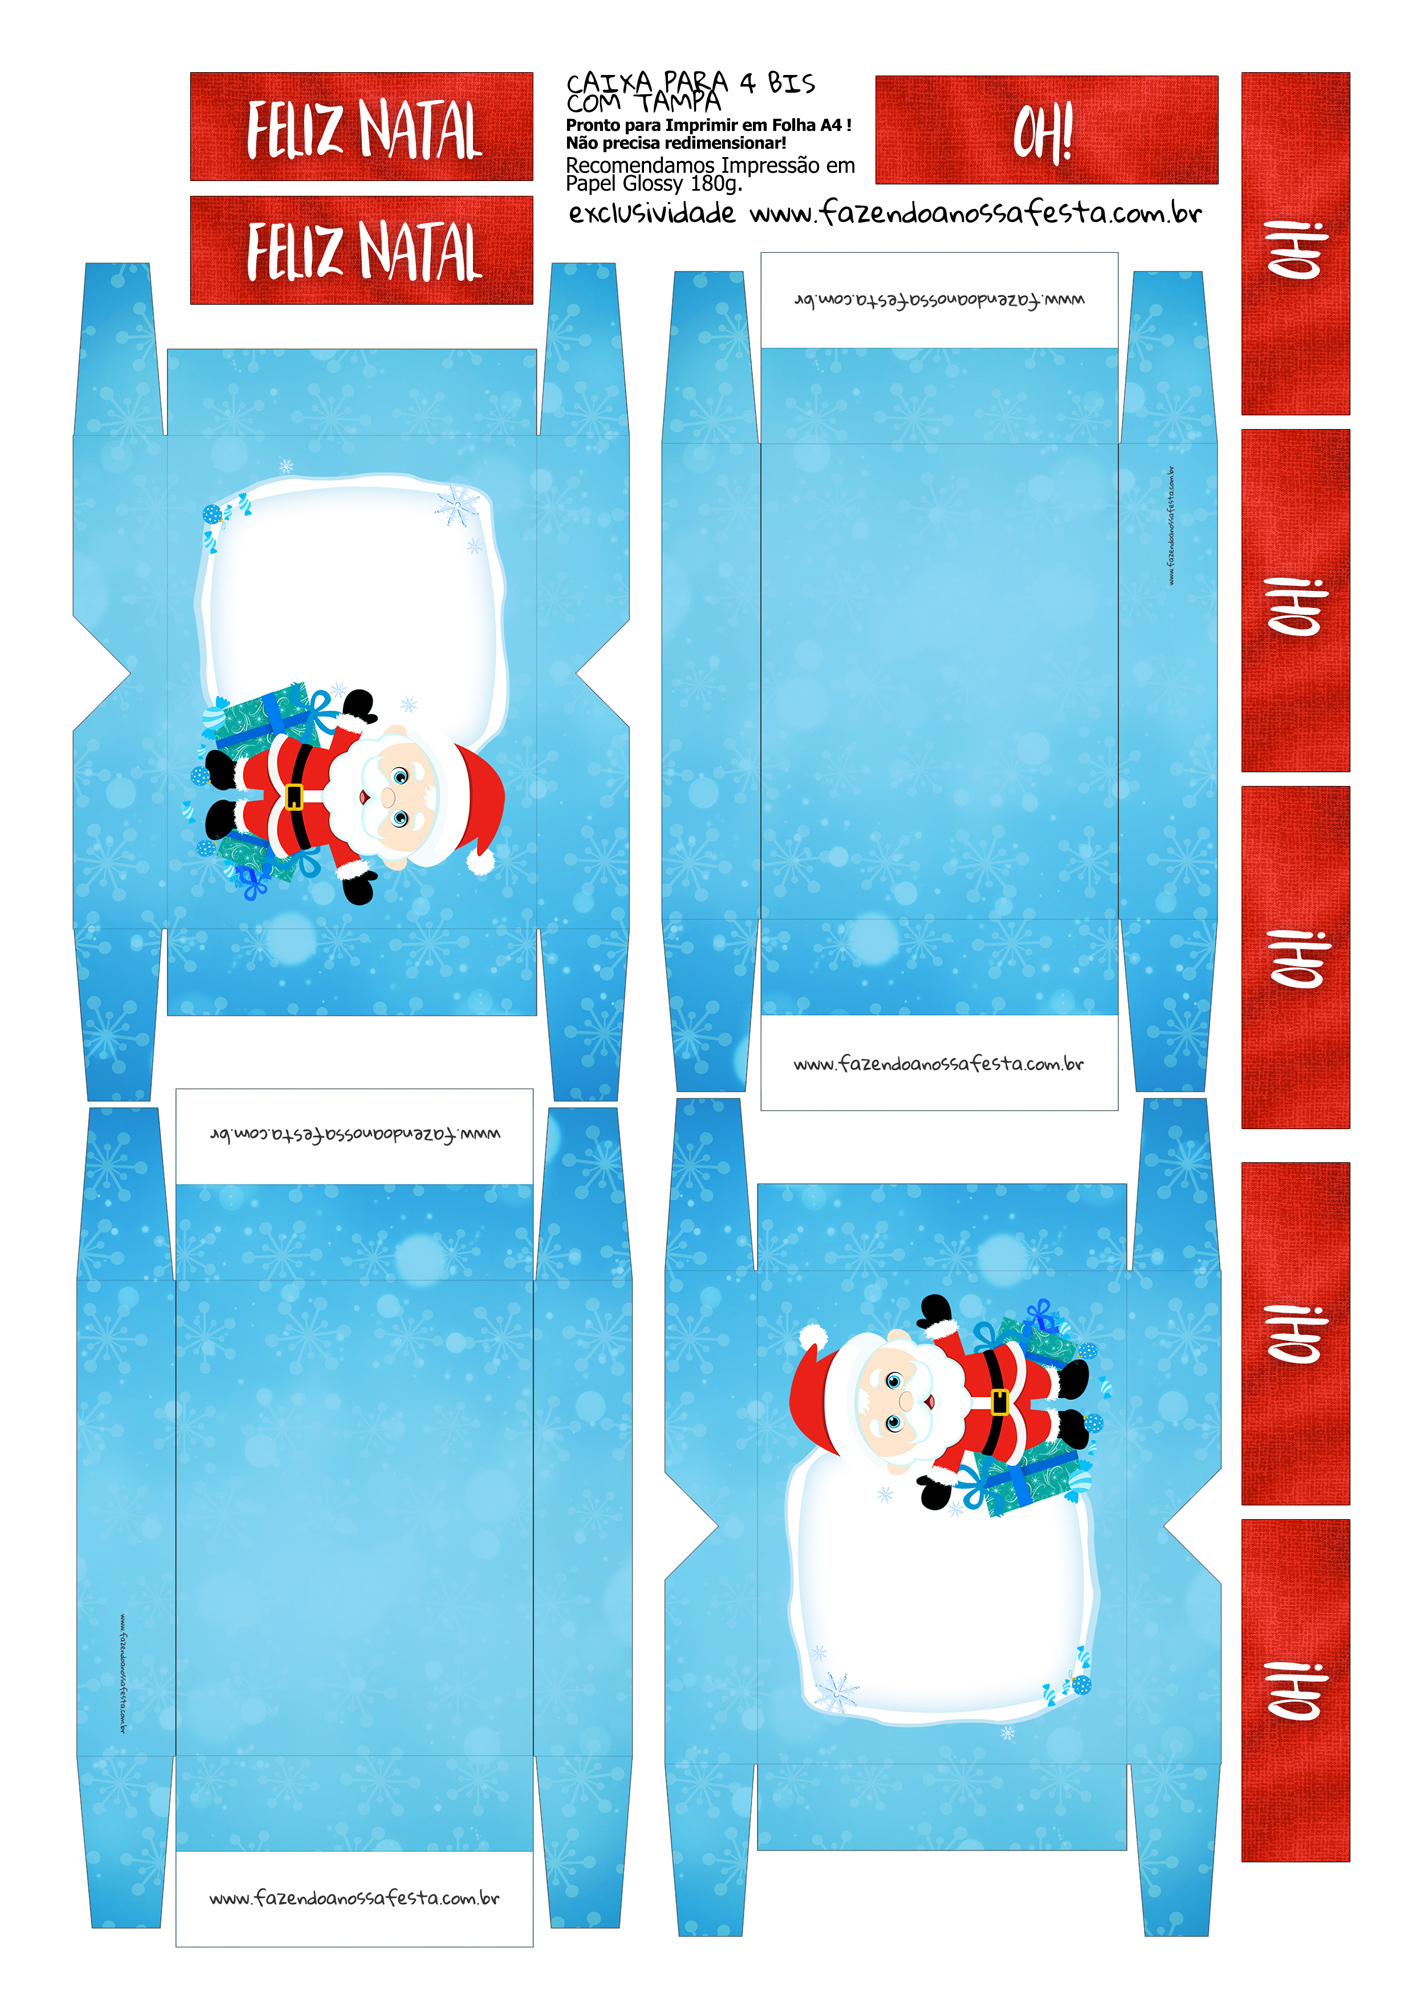 Caixa 4 Bis para Natal 2